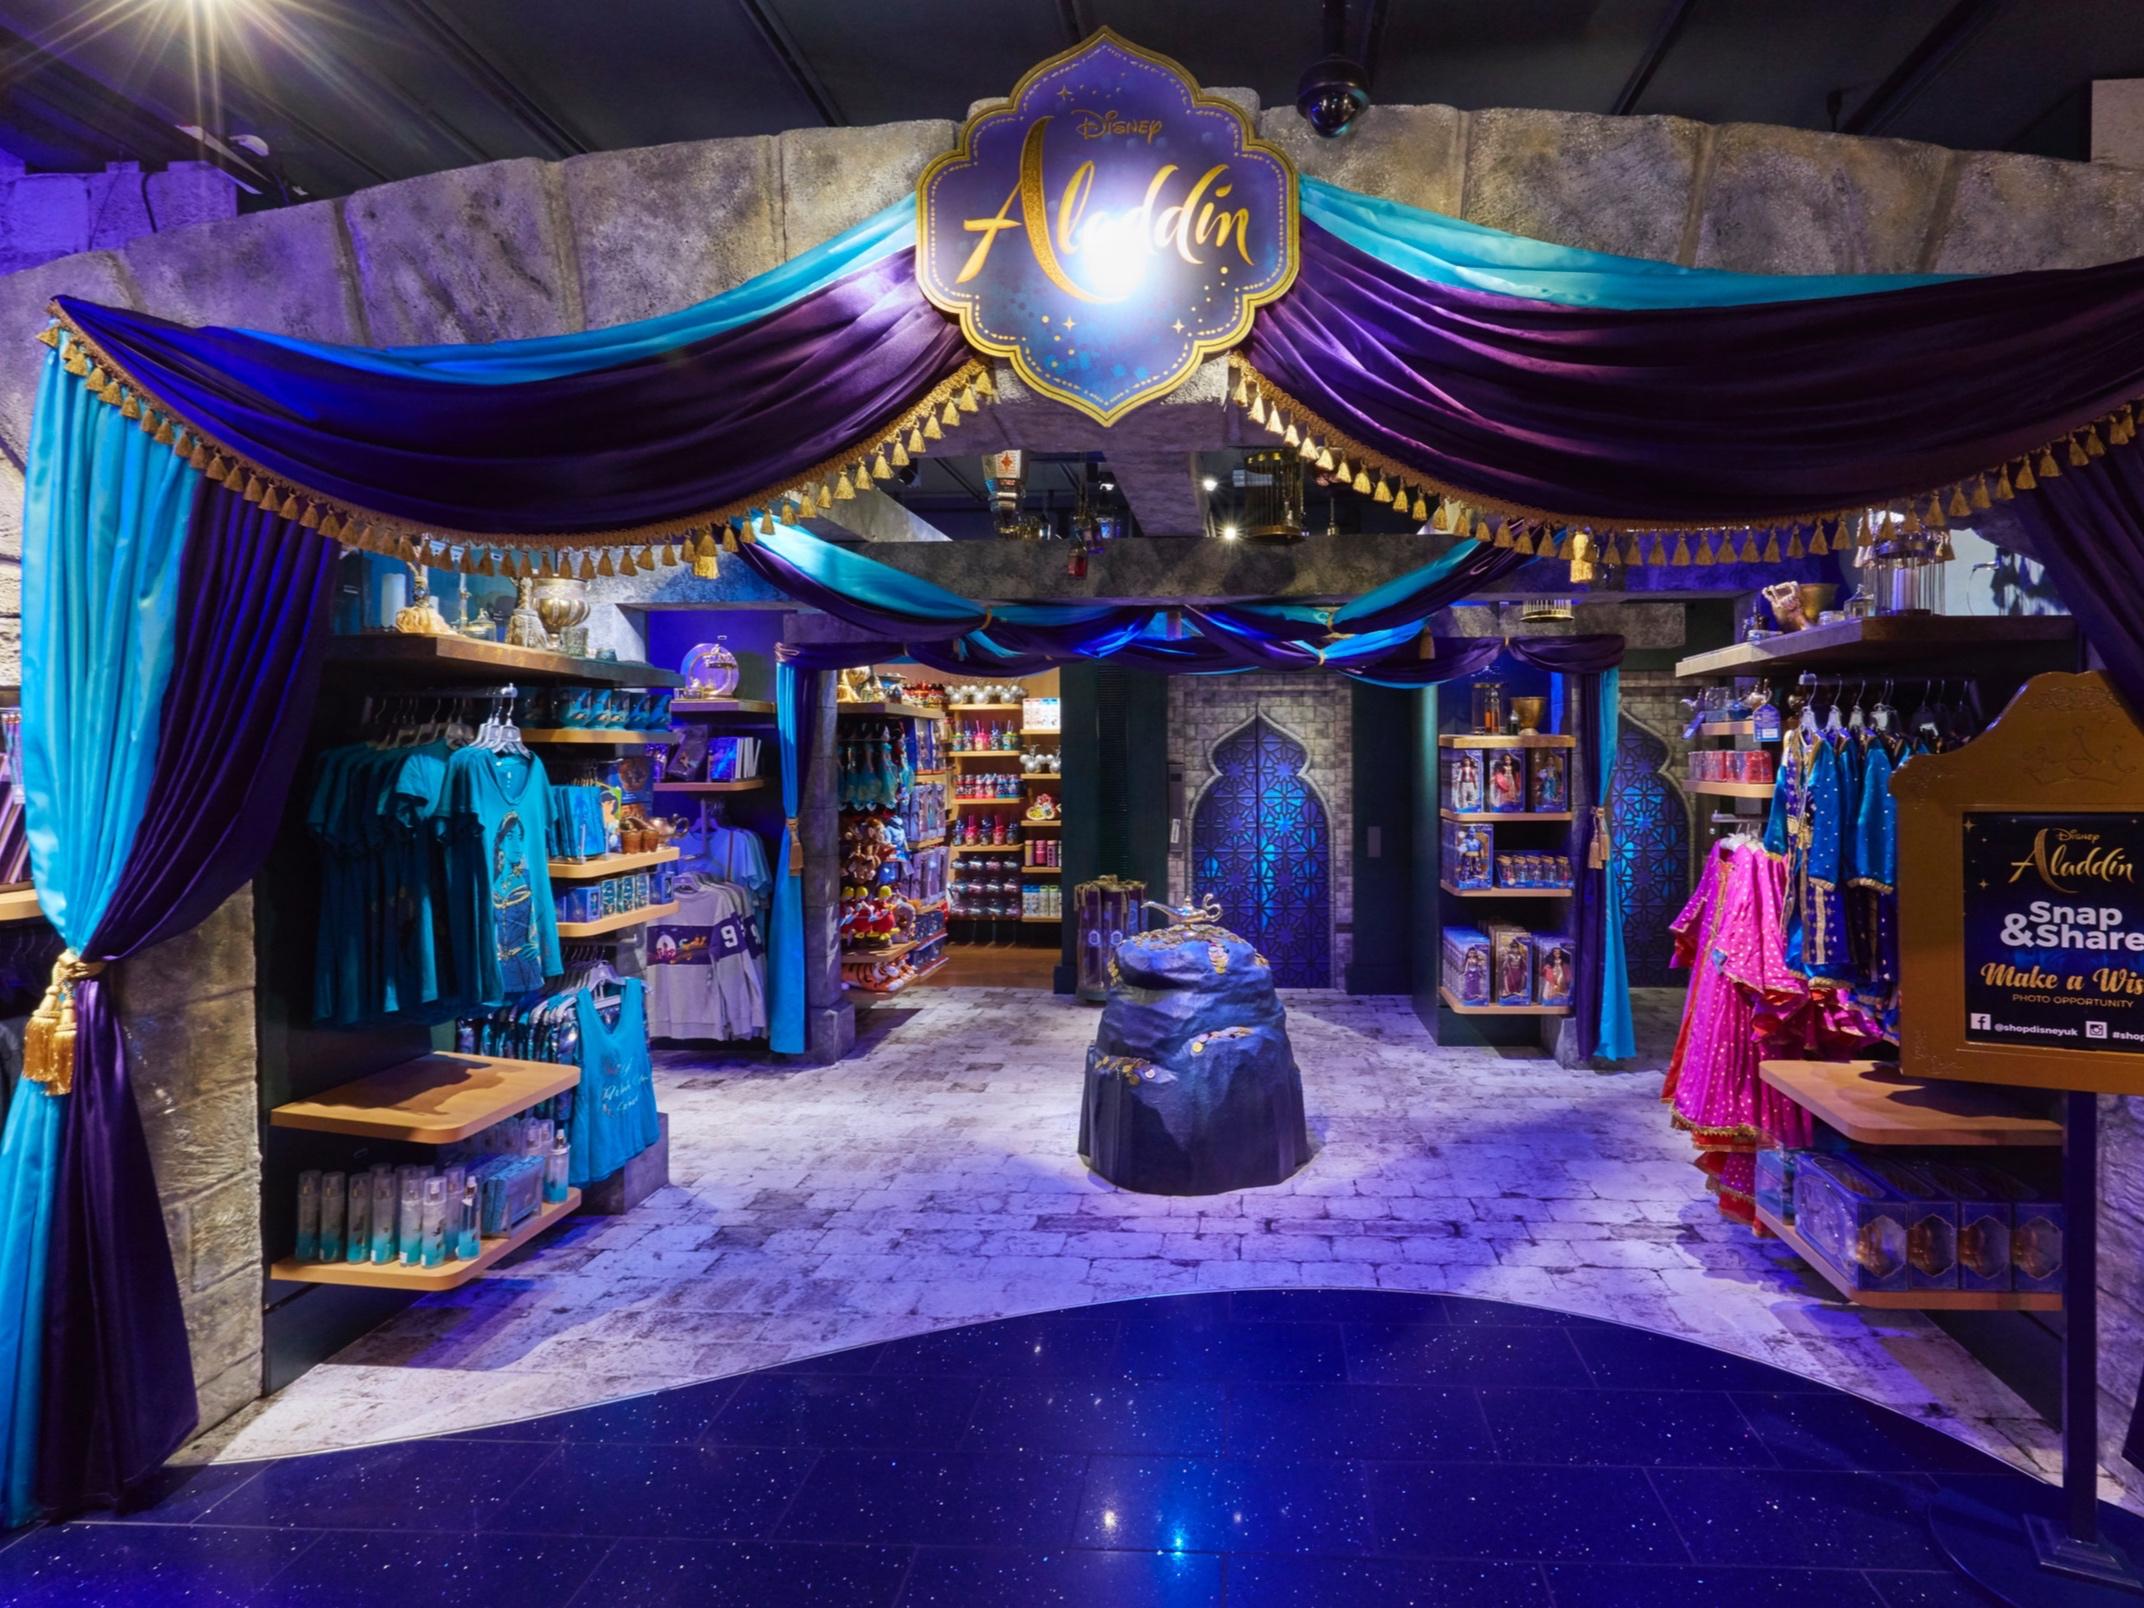 Aladdin Cave, Disney Store, Oxford Street, Propability .jpg